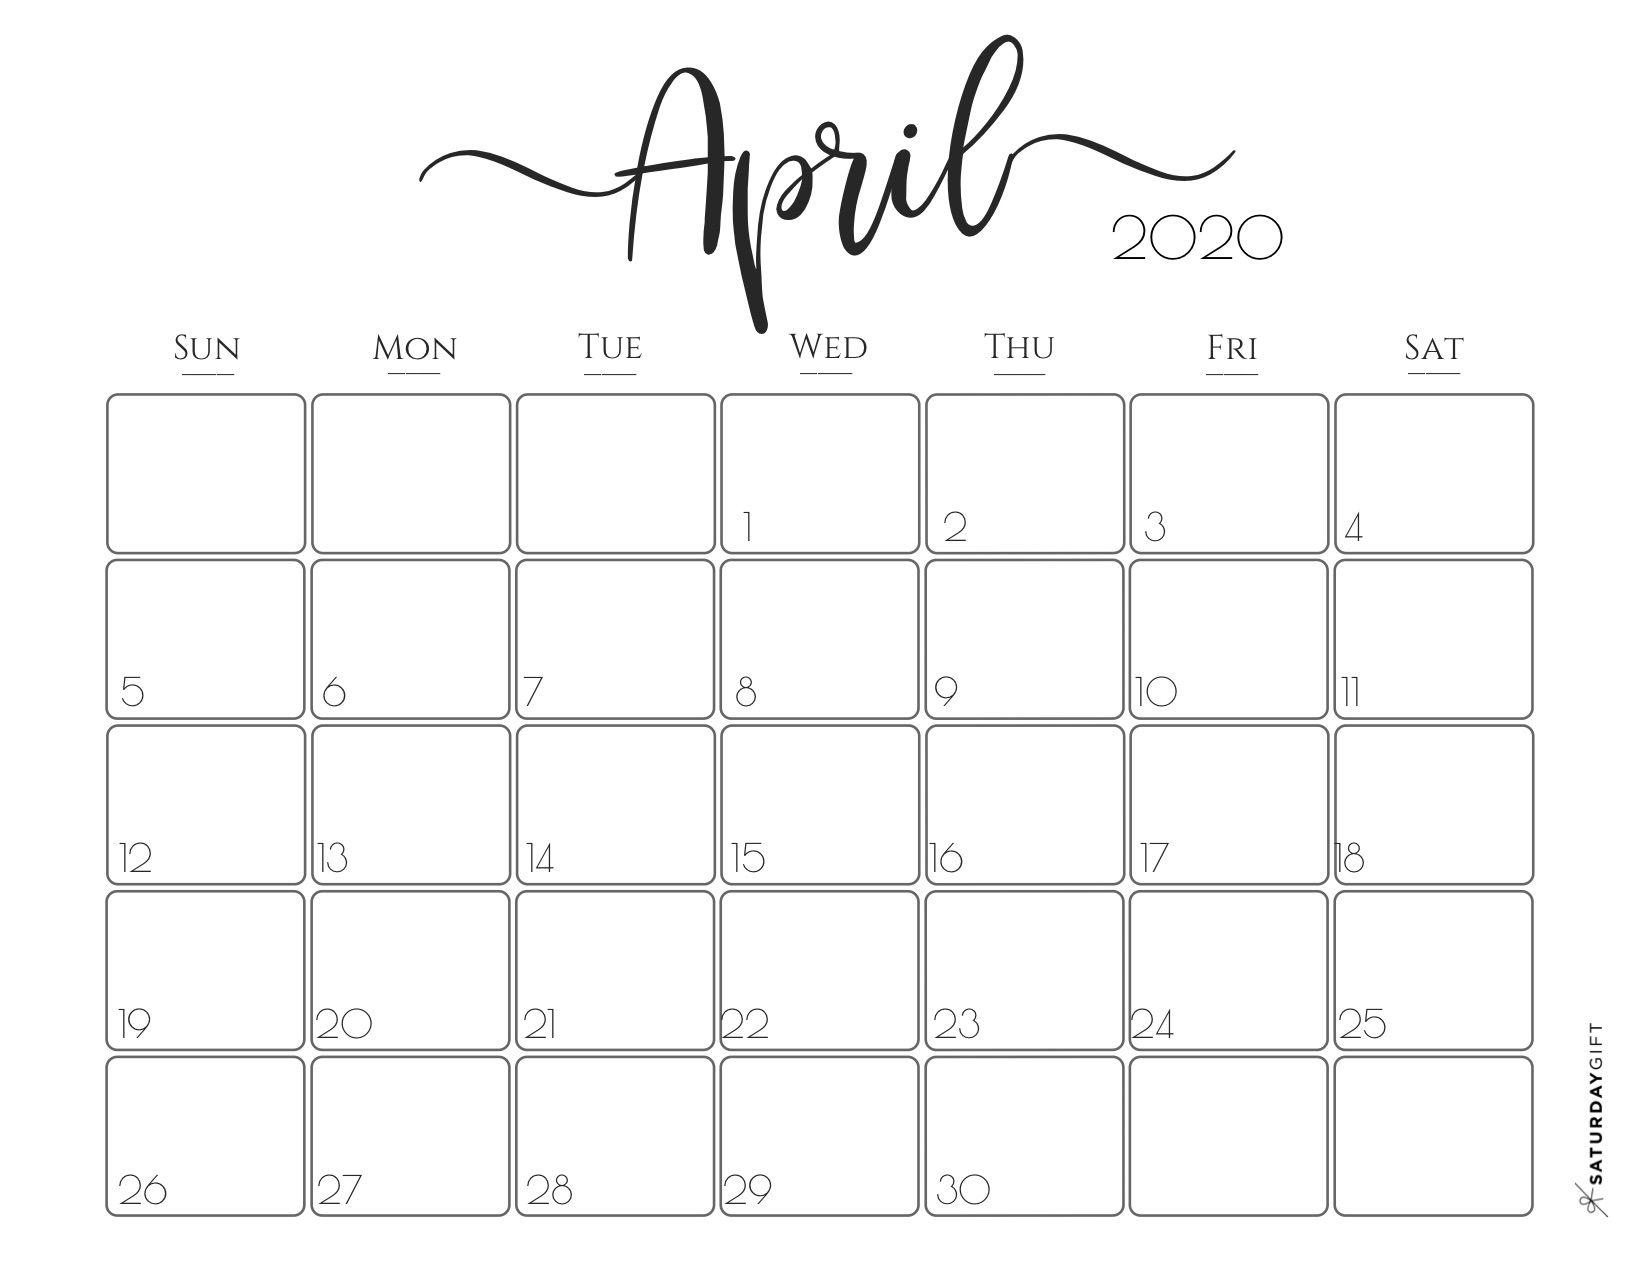 30 Best Free Printable April 2020 Calendars - Onedesblog